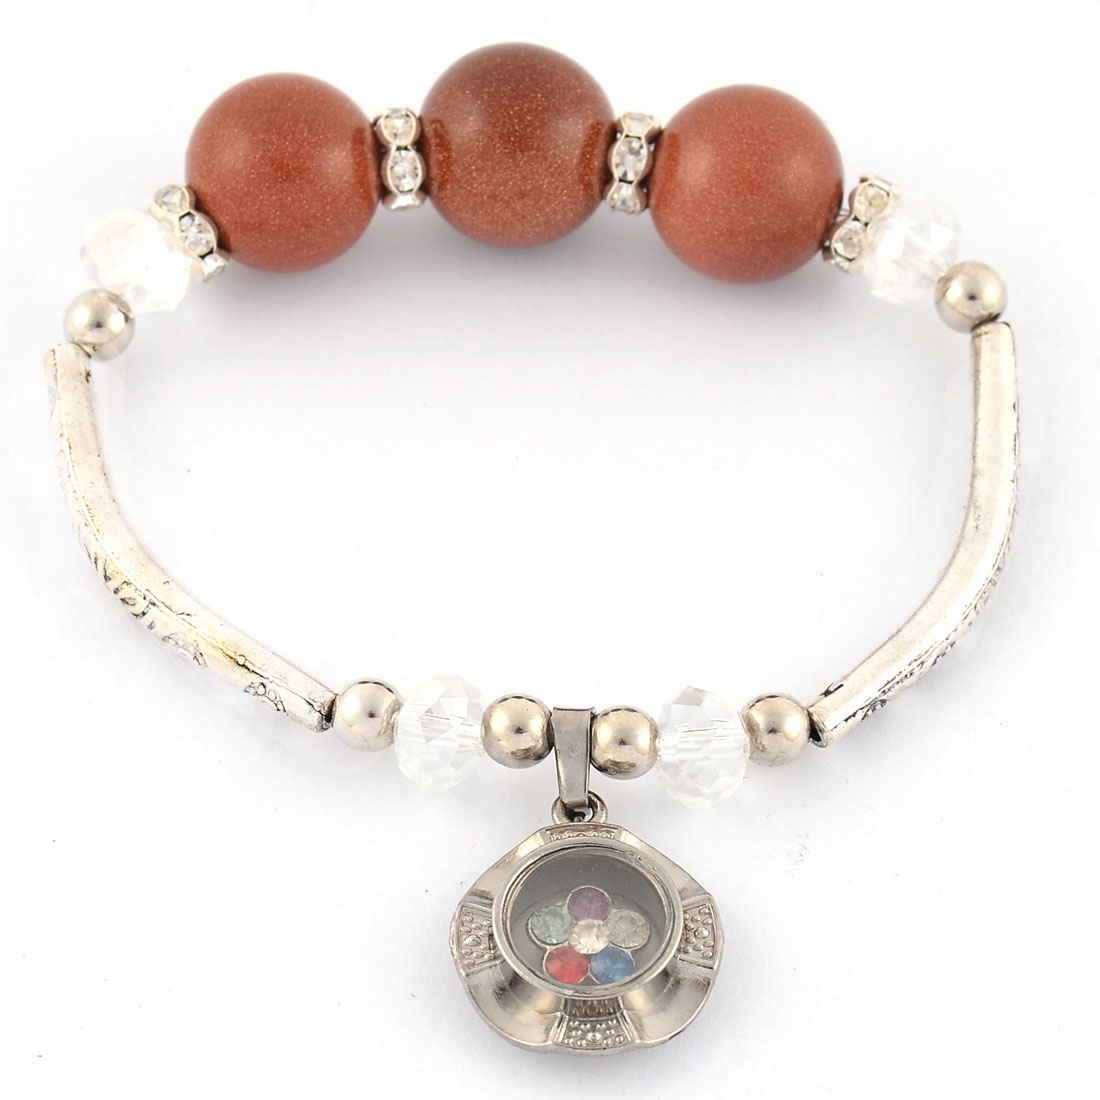 Lady Rhinestone Inlaid Pendant Elastic Bead String Wrist Bracelet Brown